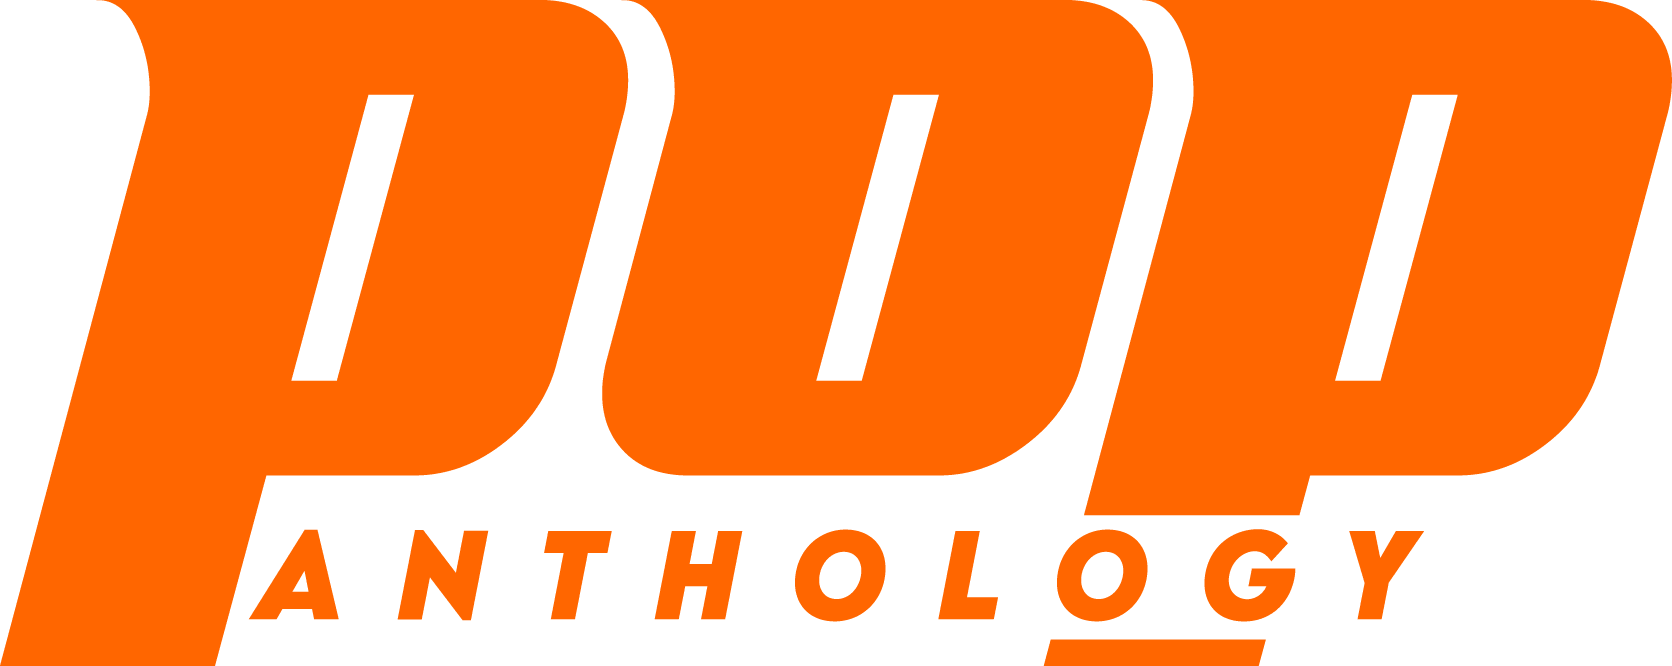 Pop Anthology